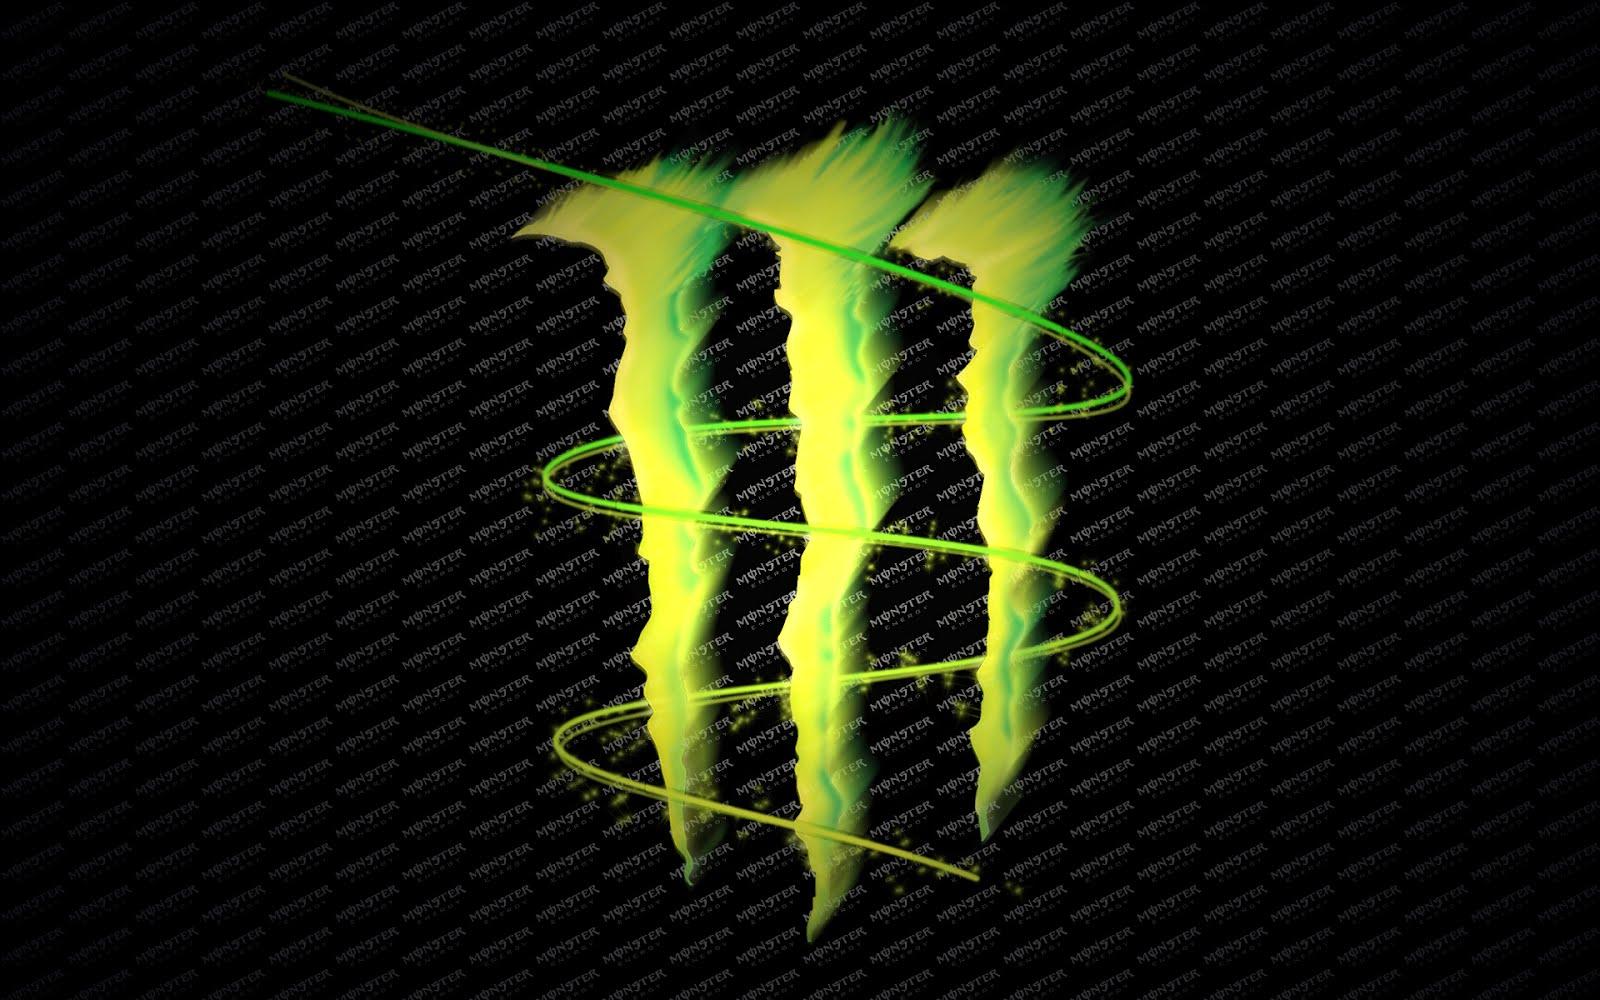 http://2.bp.blogspot.com/-3OboqUNghEY/TxlveL0ixqI/AAAAAAAAFYw/MWlKCK93Y7M/s1600/Monster_Energy_101.jpg